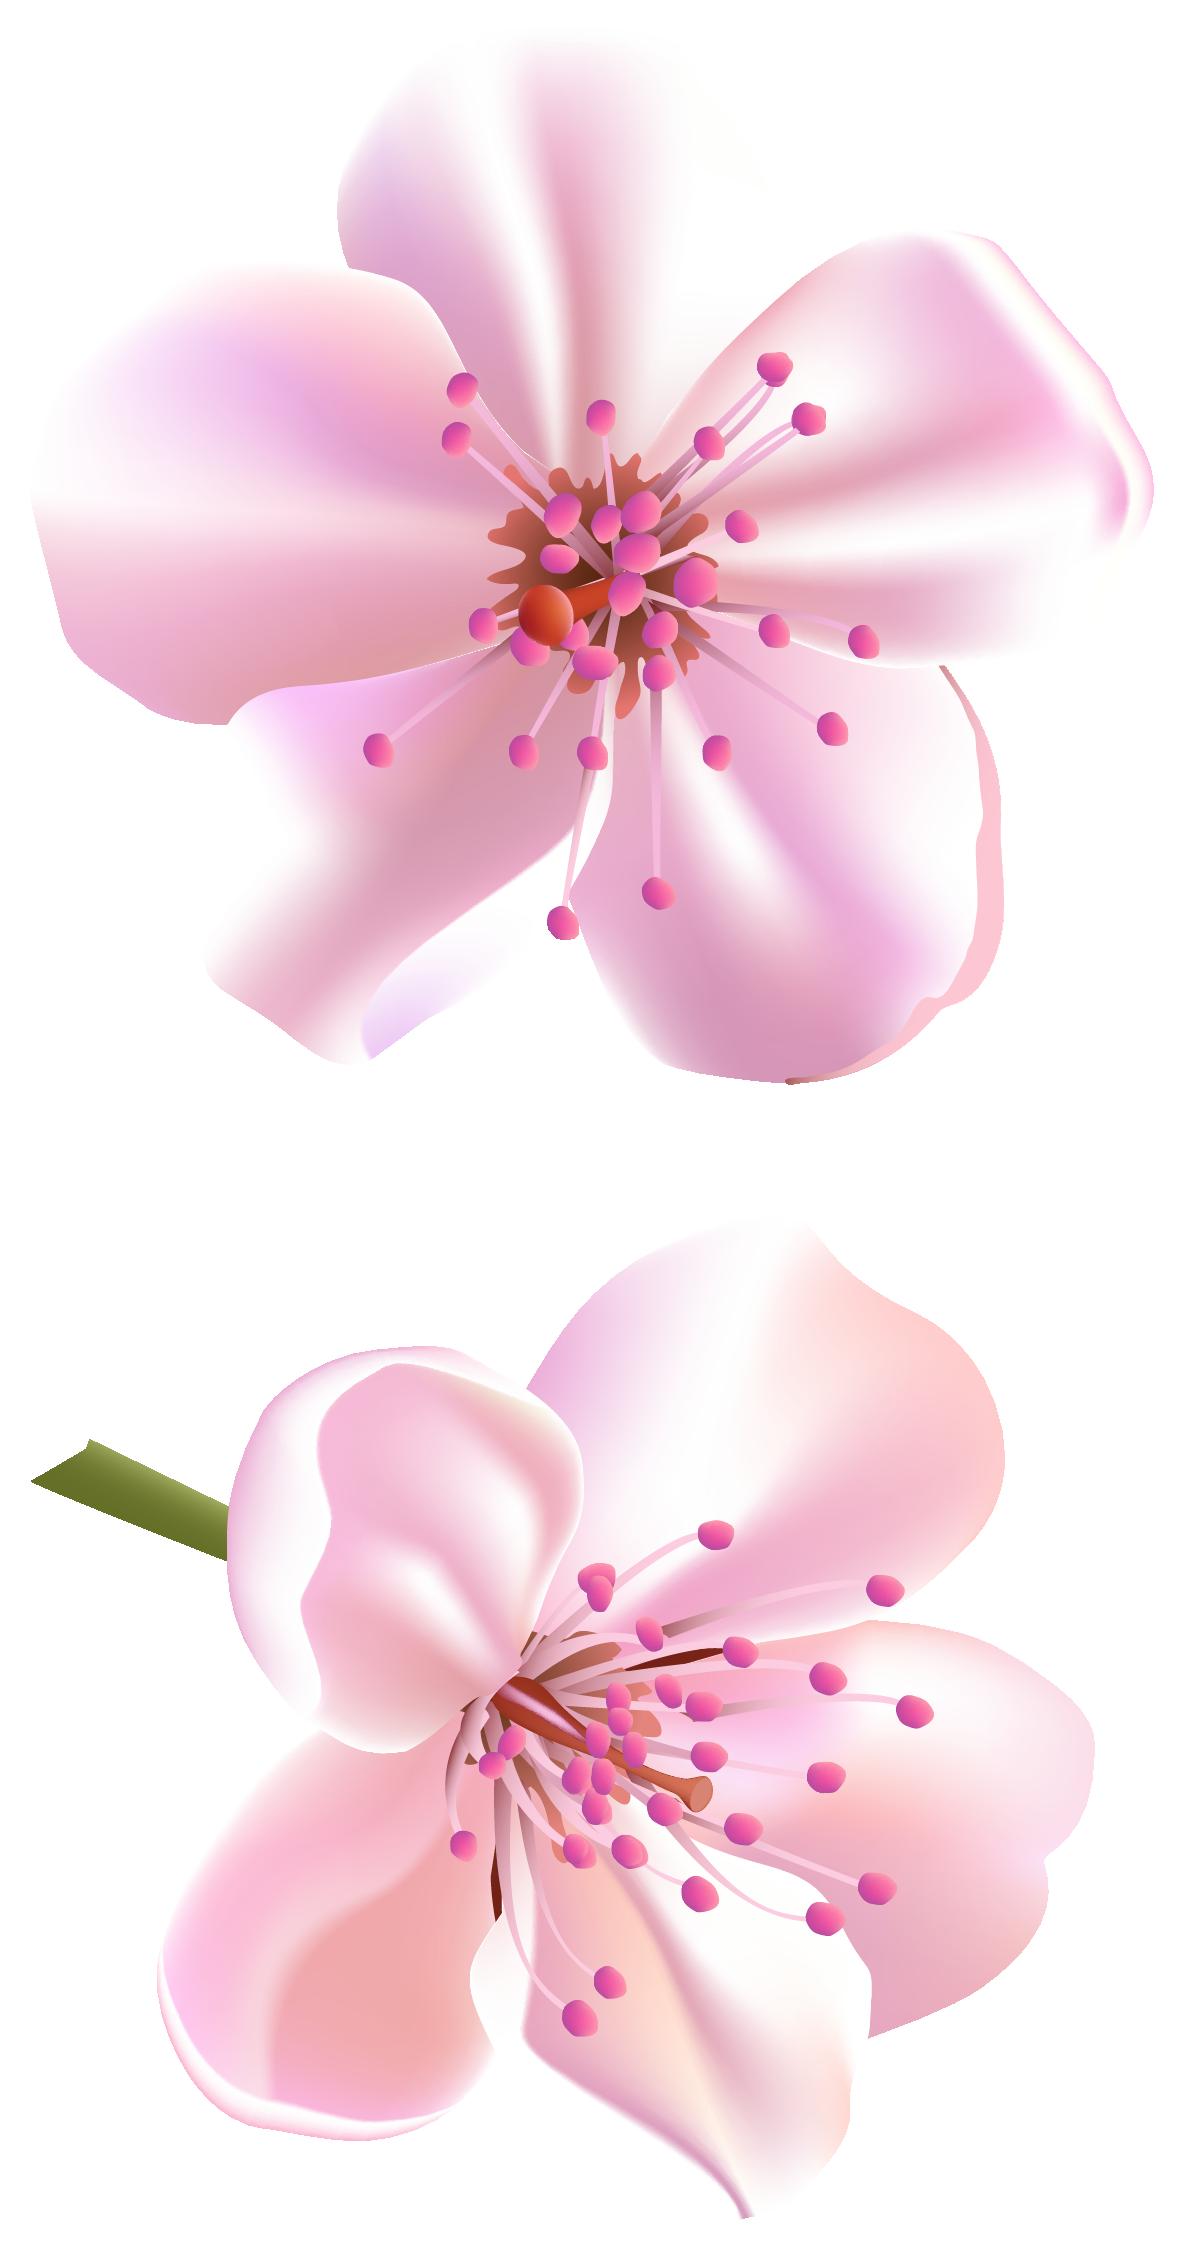 Spring Pink Tree Flowers Png Clipart Flower Prints Framed Flower Clipart Clip Art